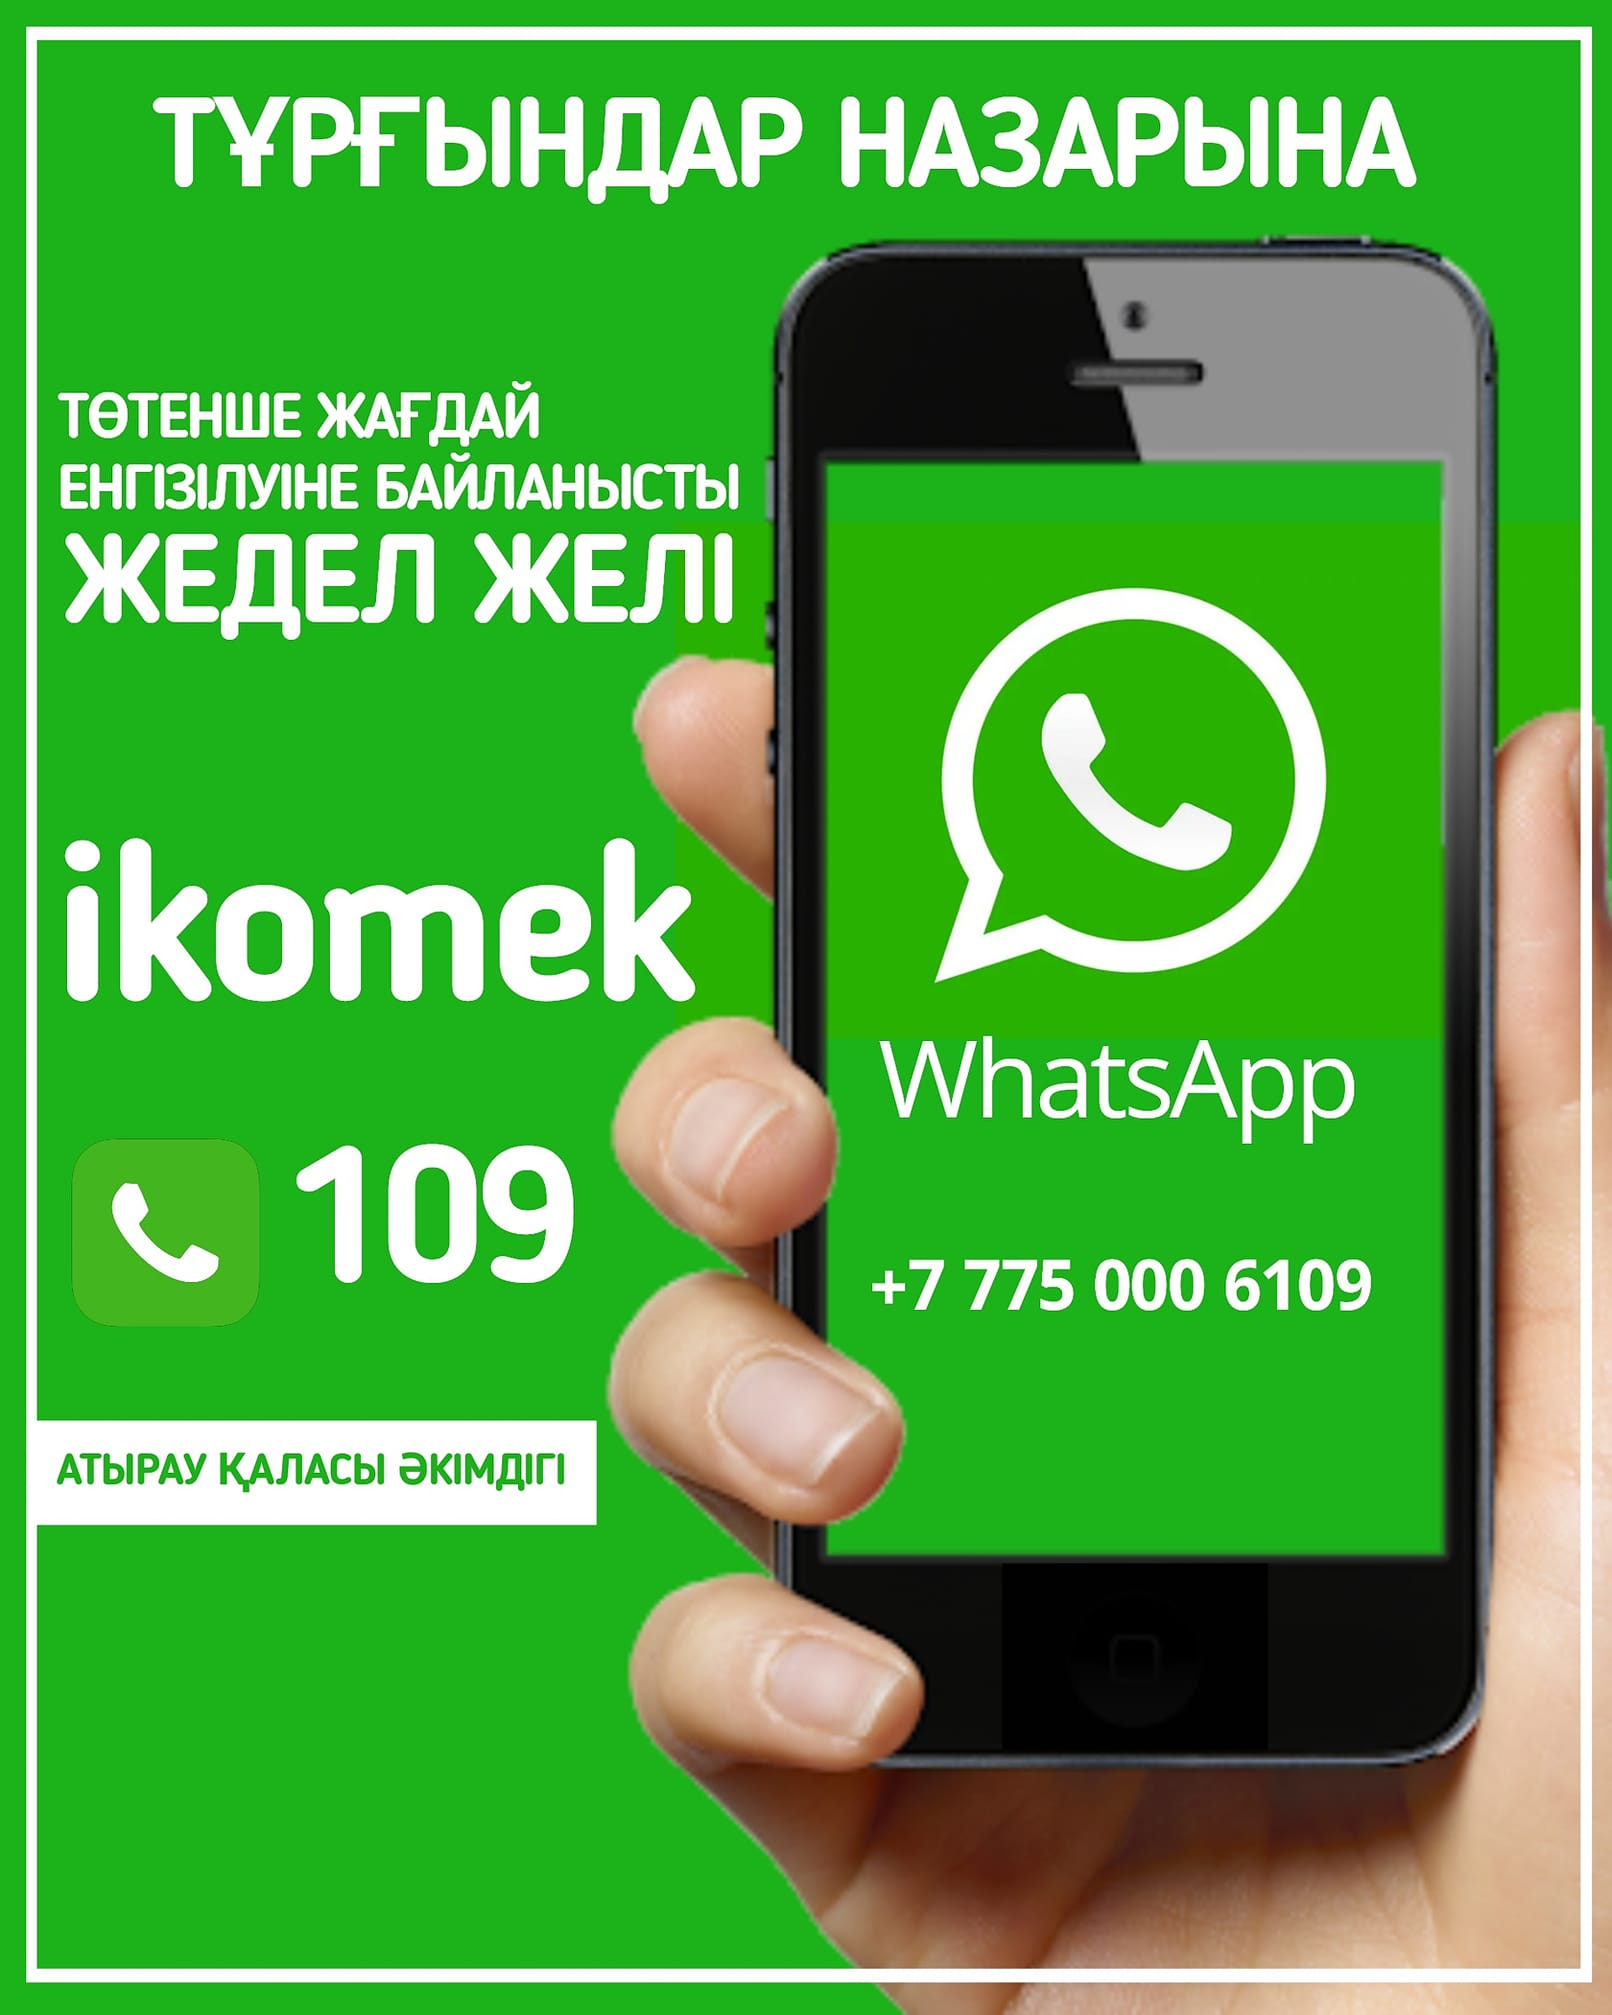 92054634 250813559645631 5318887744179535872 o